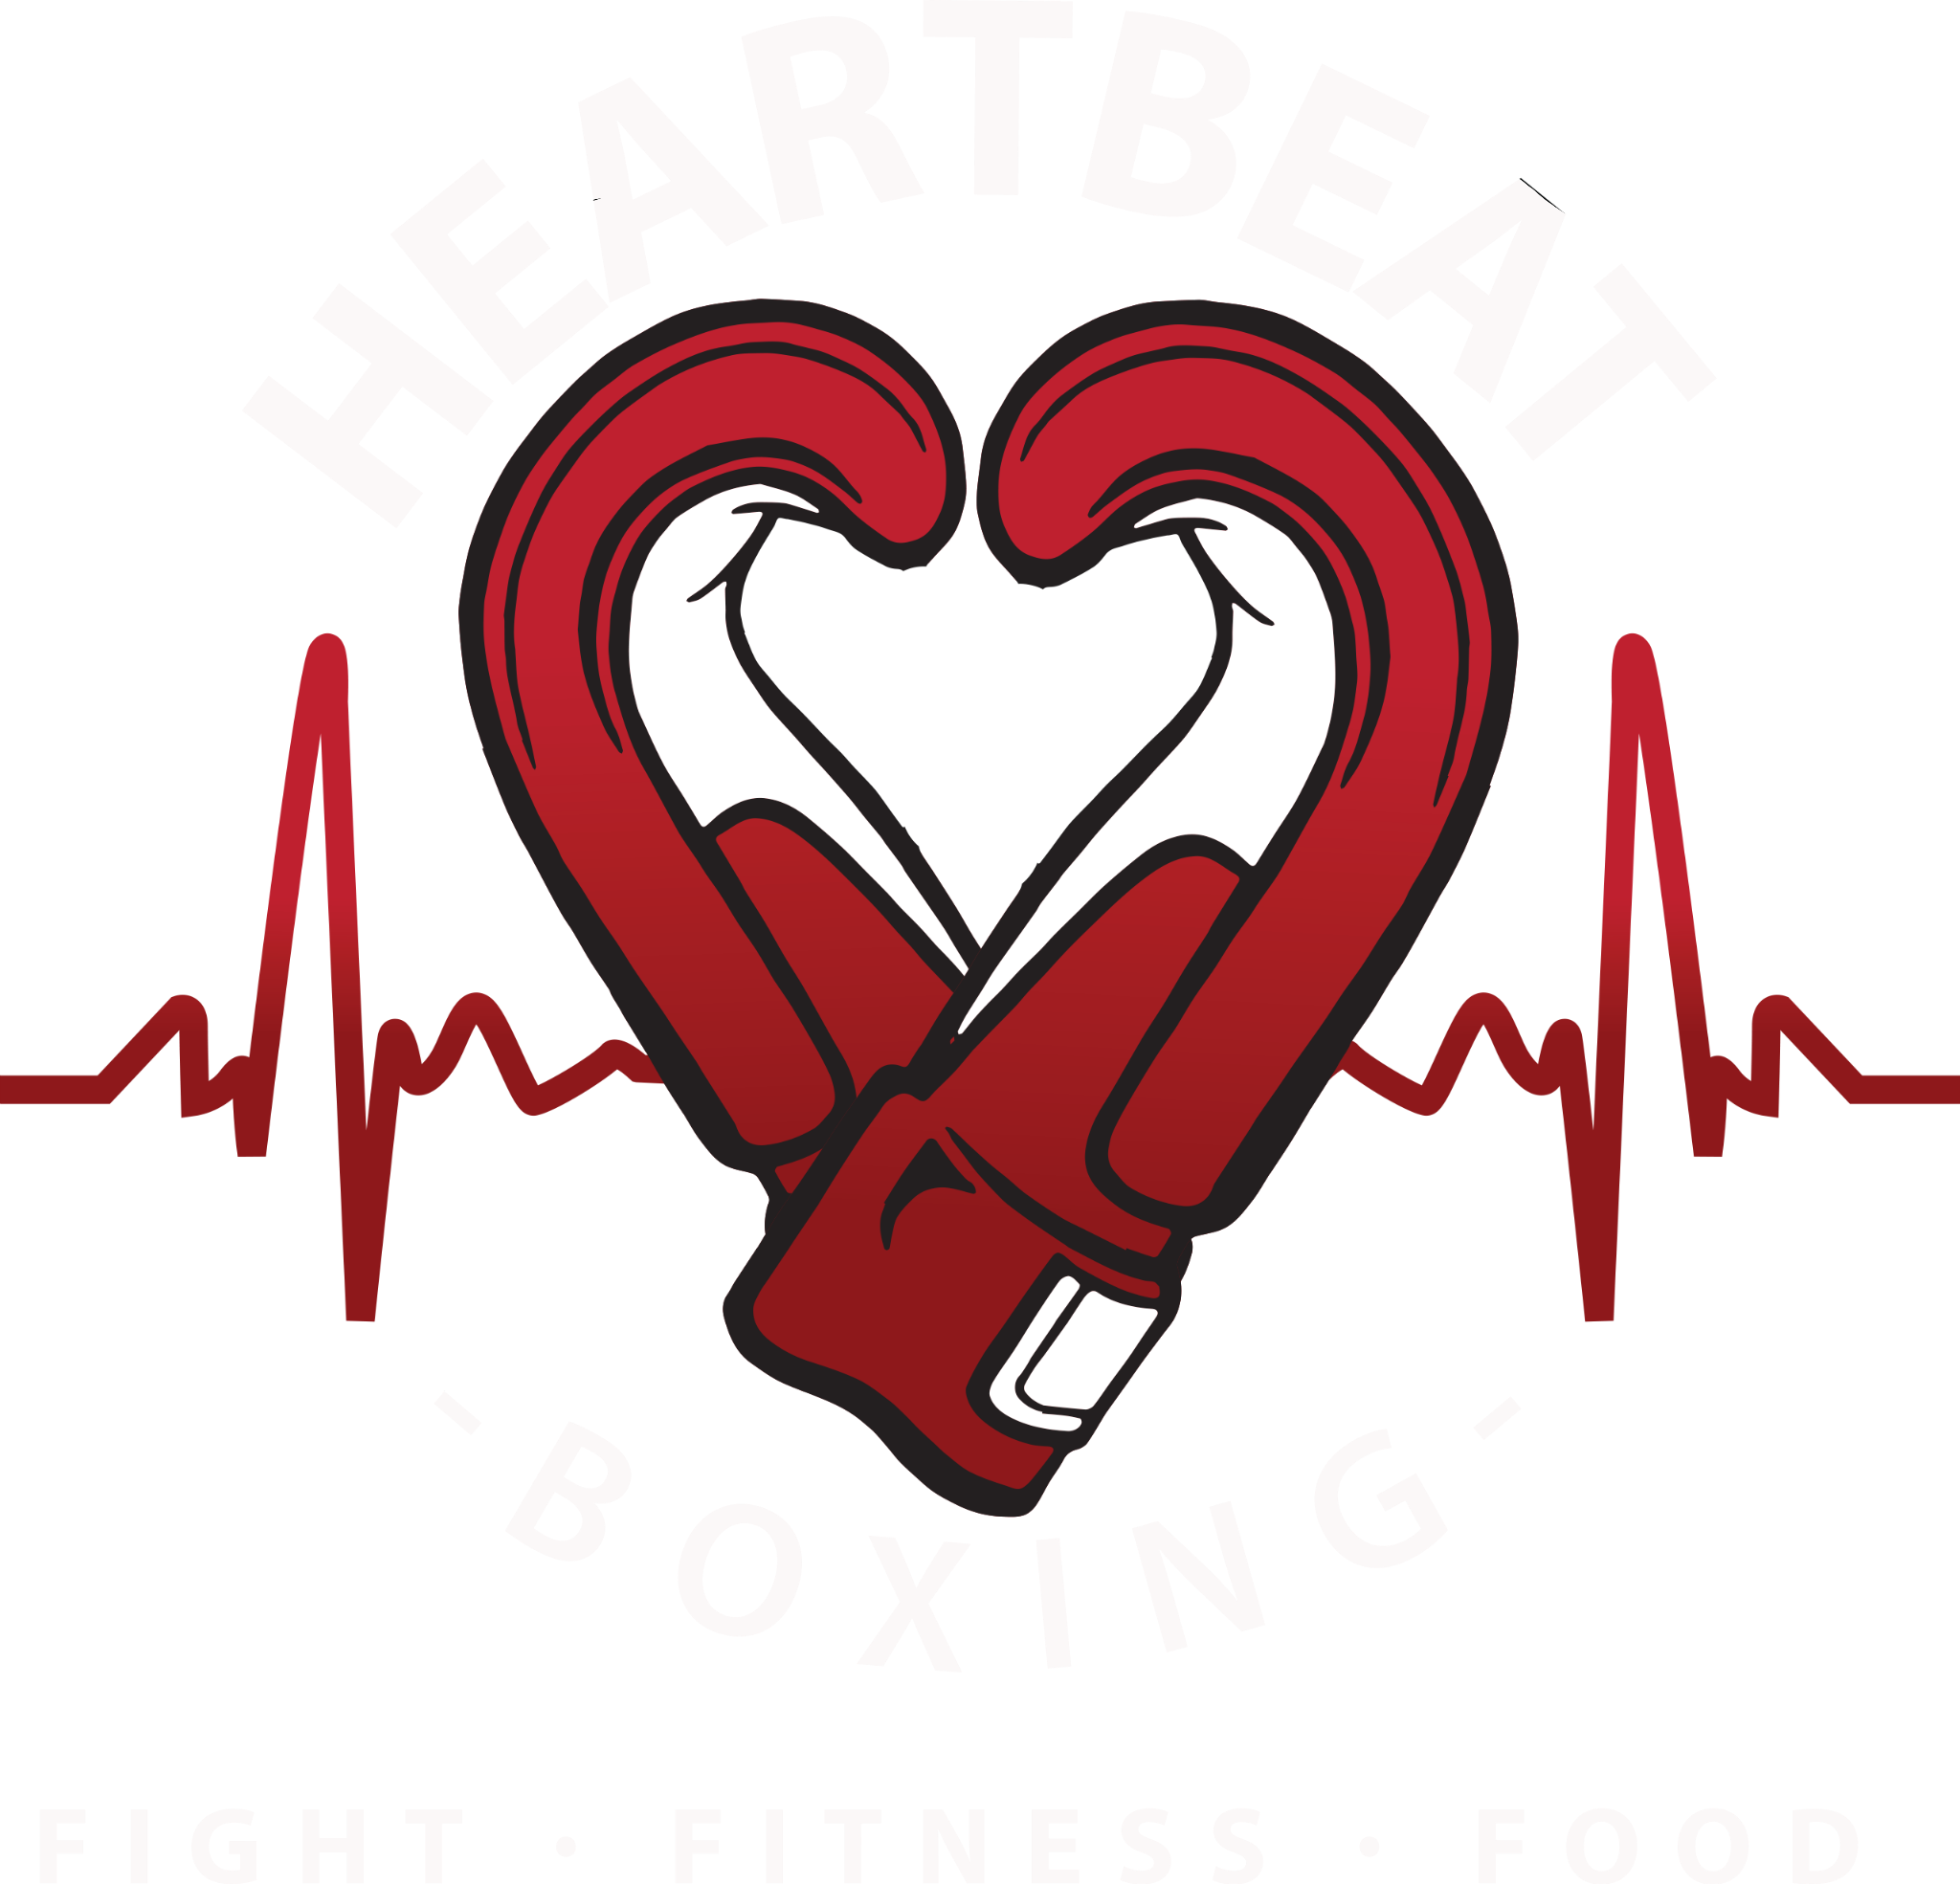 Heartbeat basketball clipart image free stock Ruby's Ring – Heartbeat Boxing image free stock